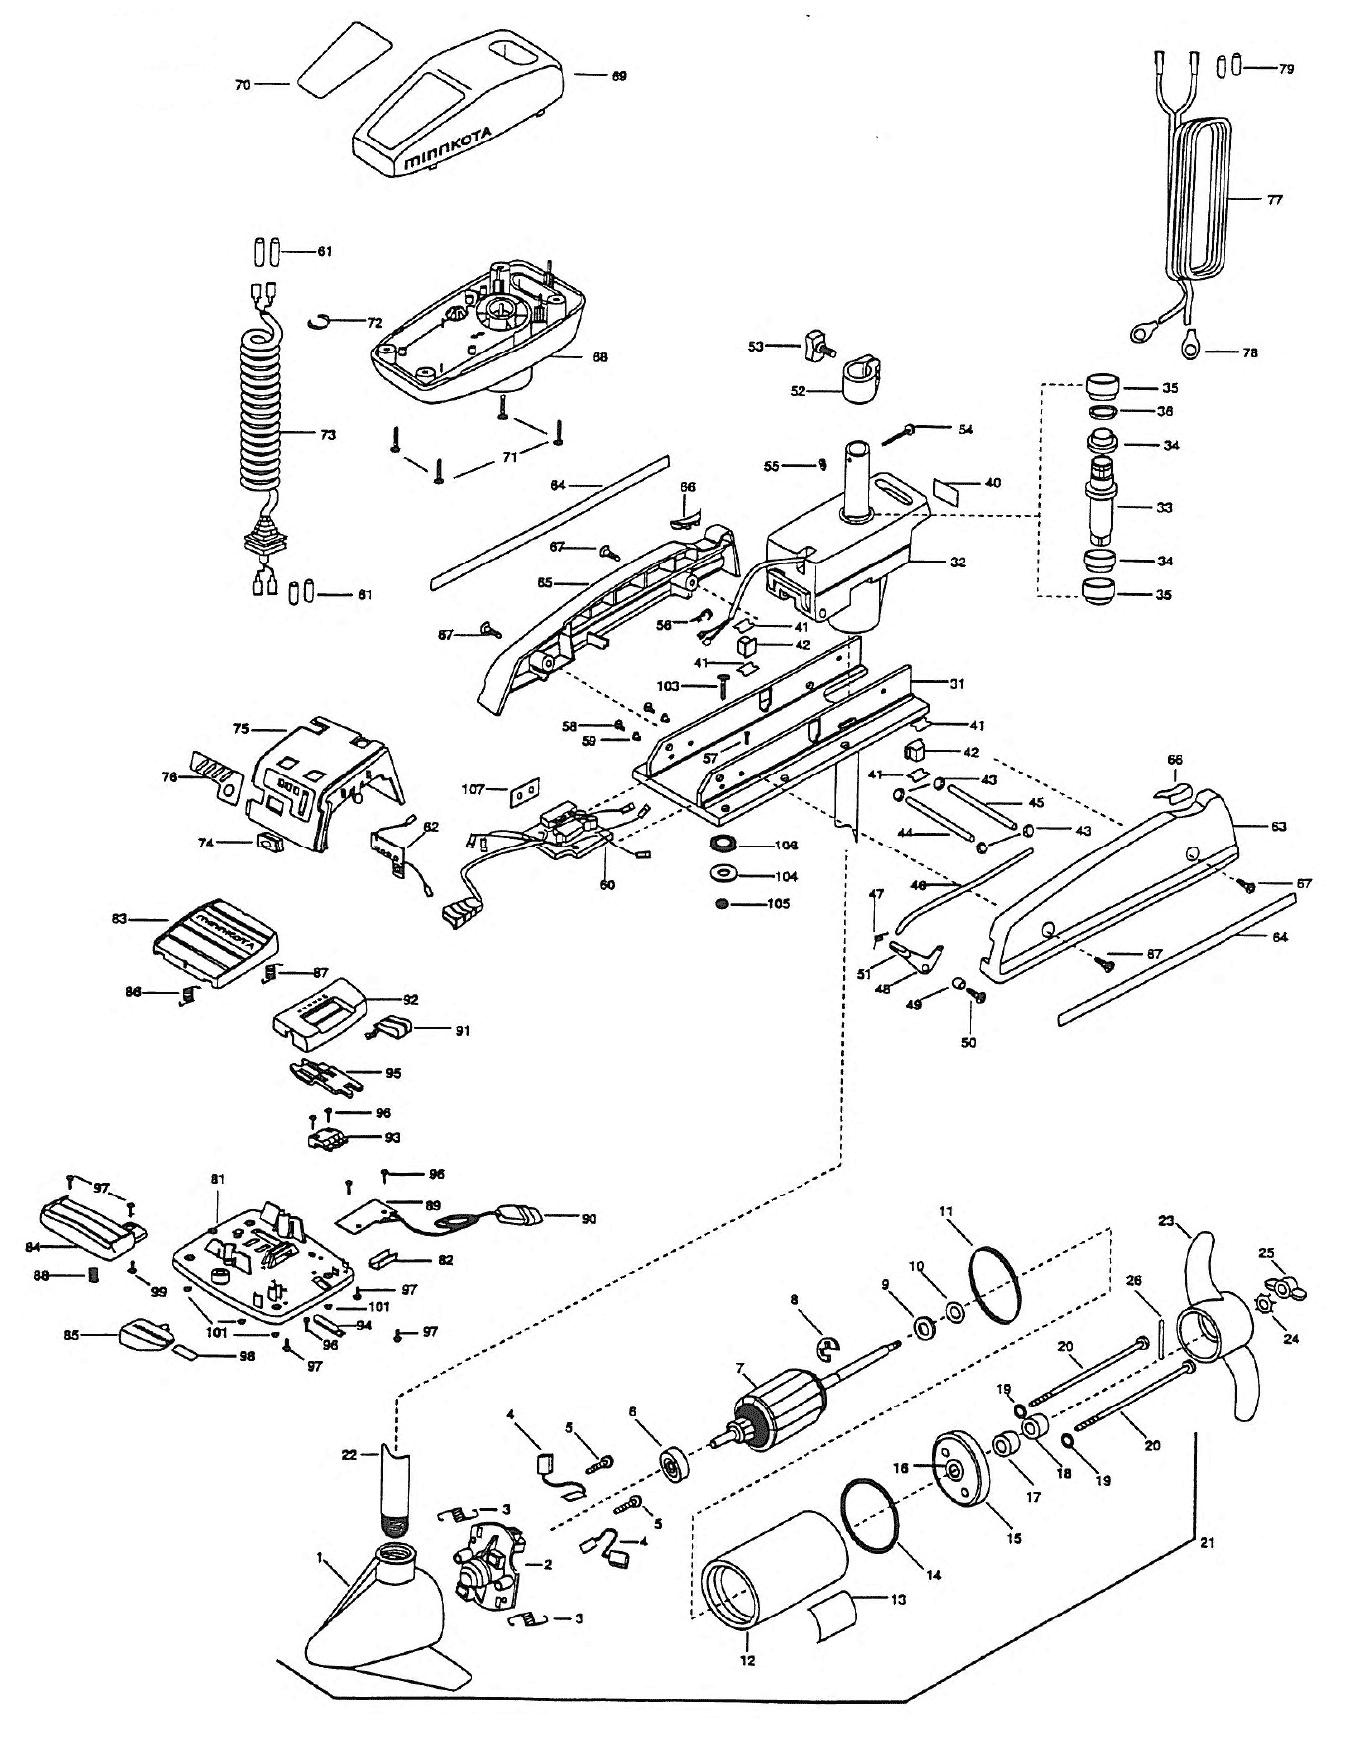 Minn Kota Wiring Diagram 50 Pd Trusted Diagrams Terrova Powerdrive 48 Inch Parts 1999 From Fish307 Com